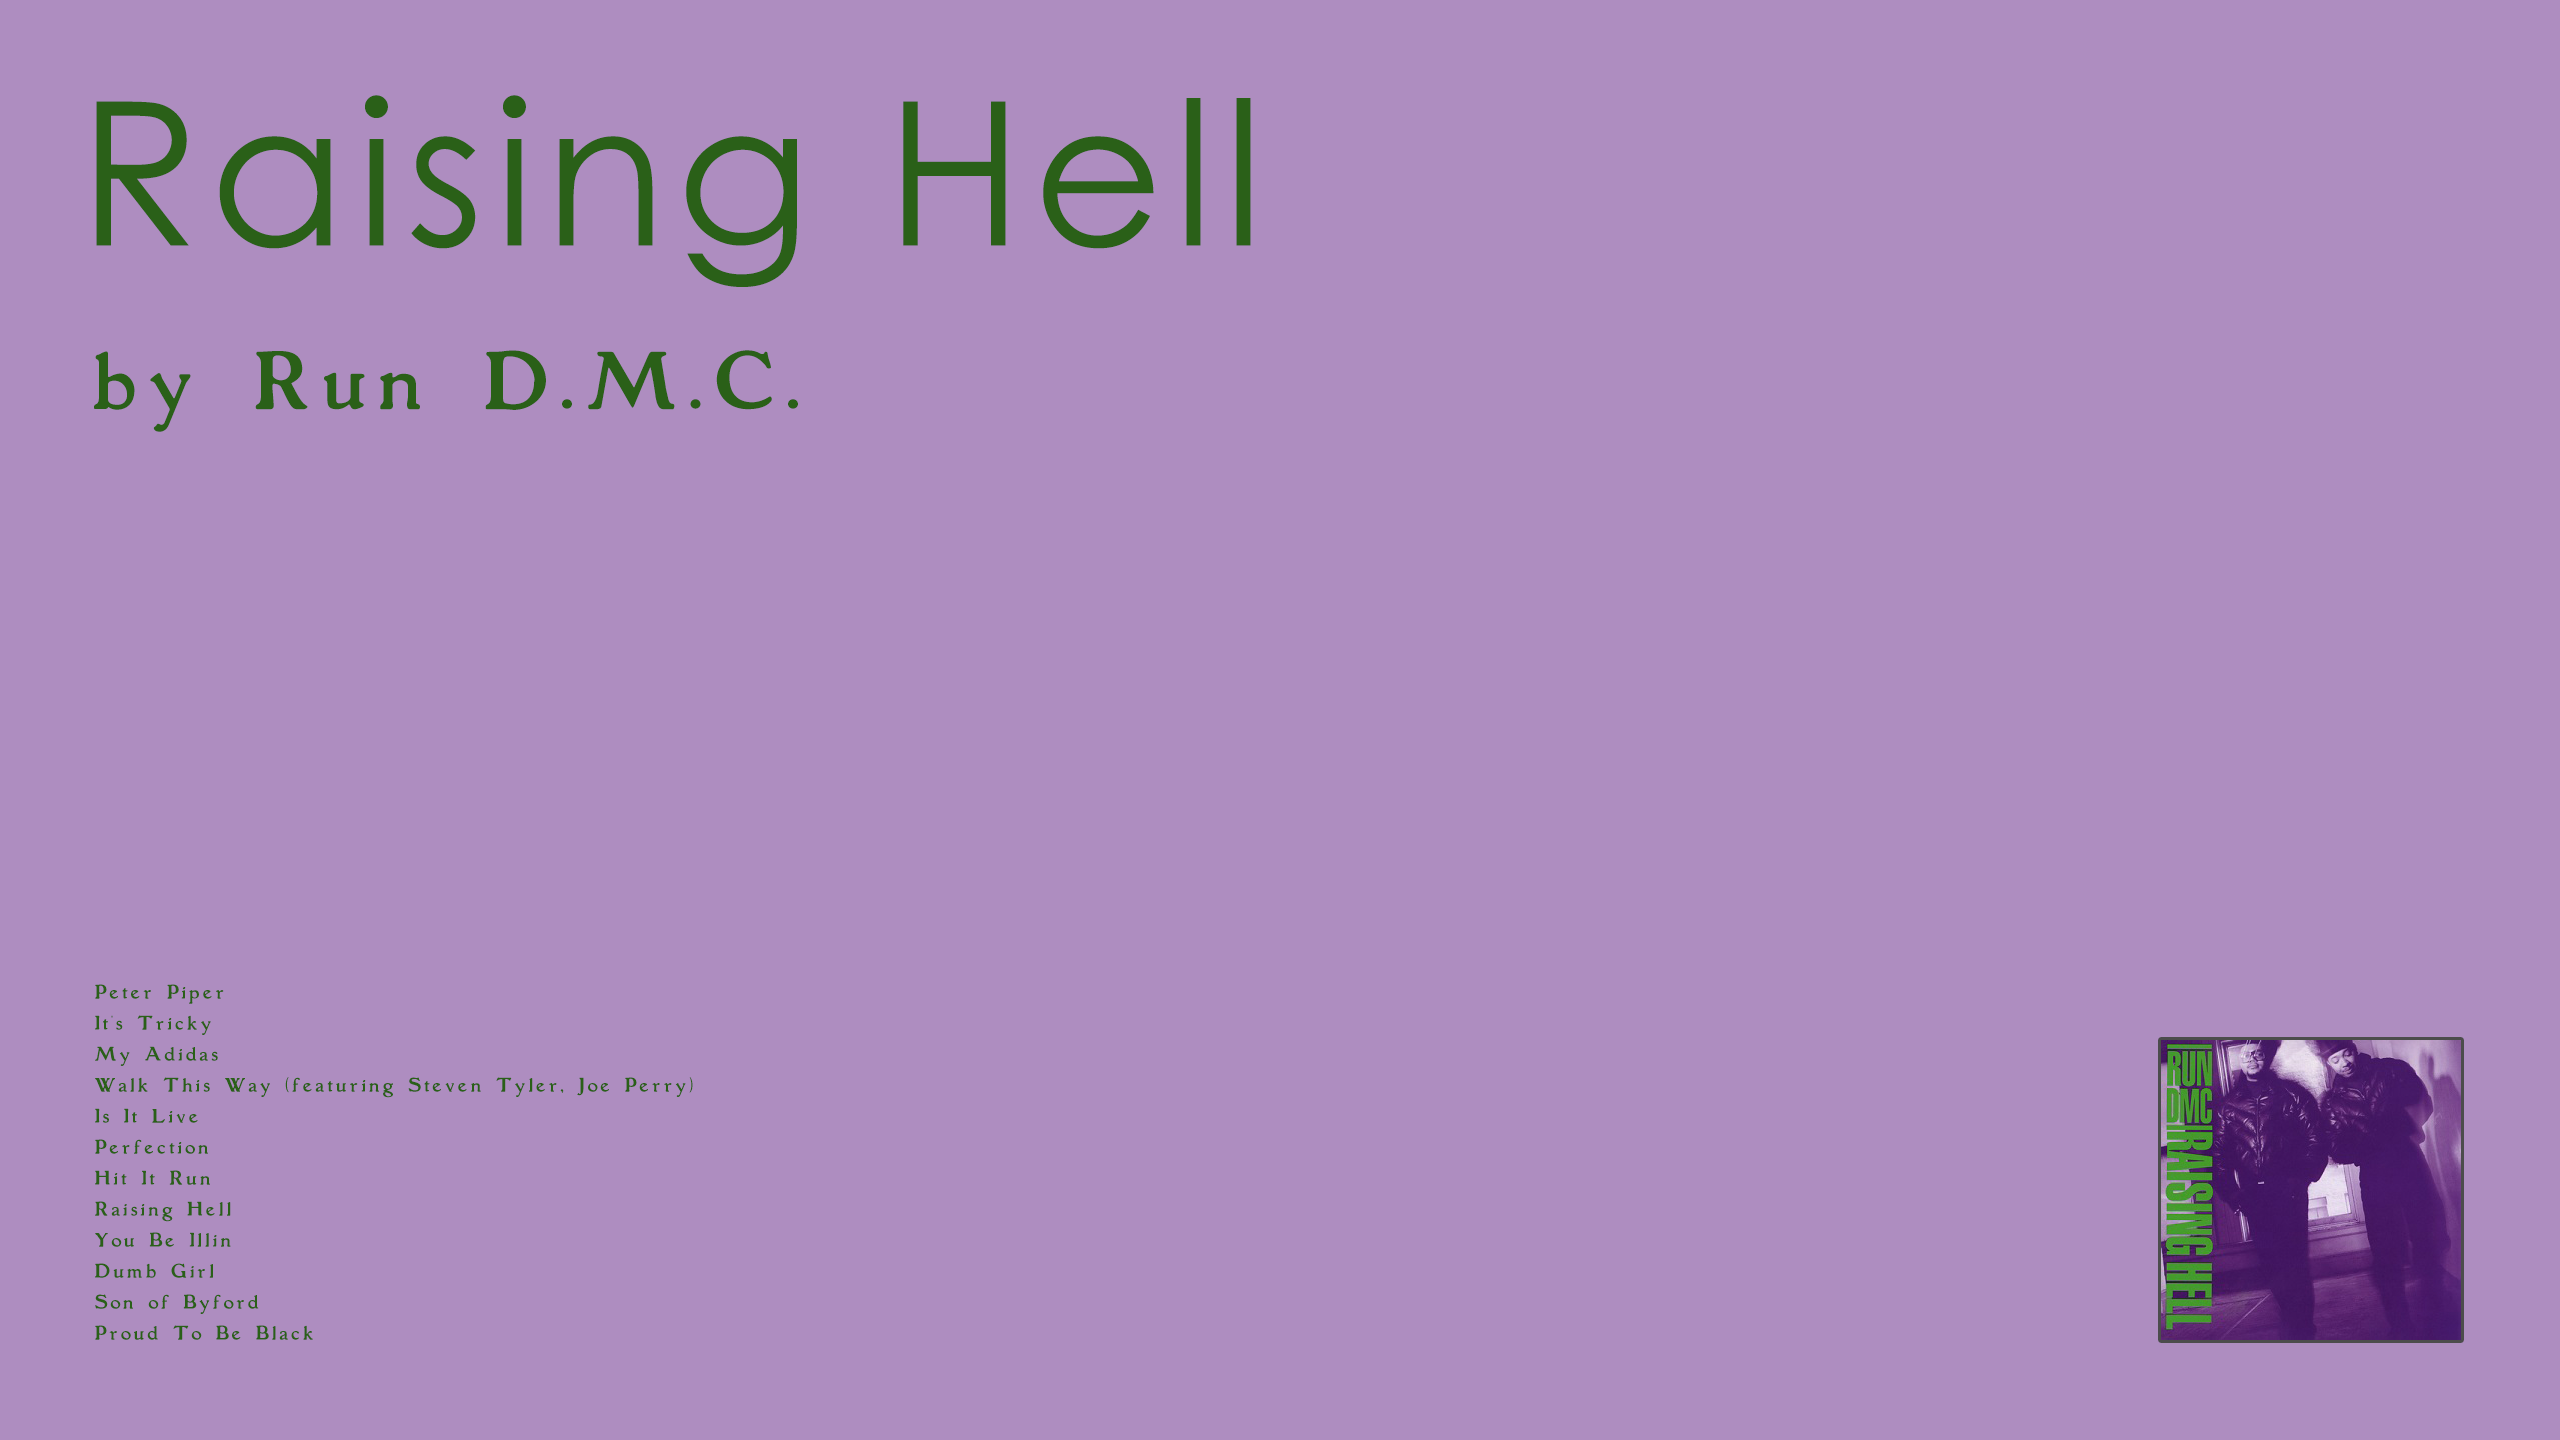 Run D.M.C - Raising Hell